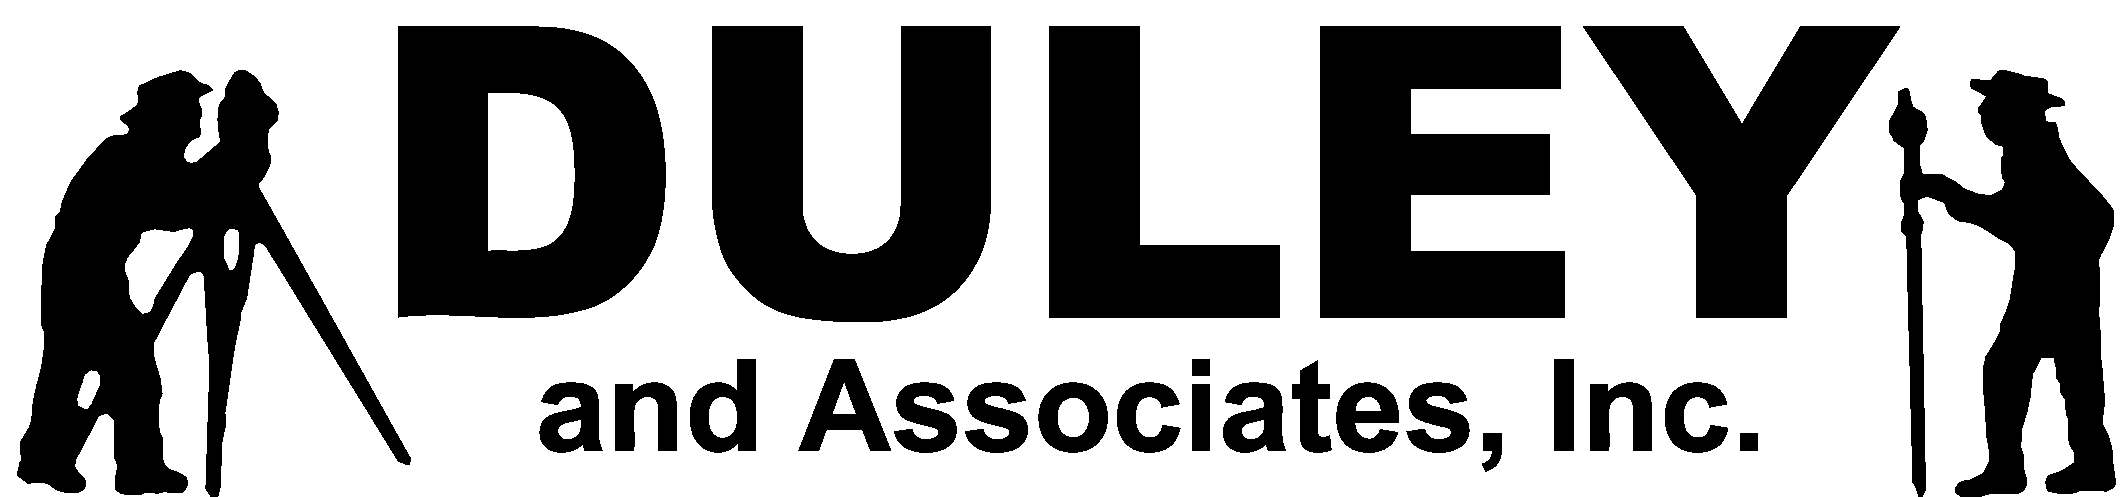 Duley and Associates, Inc.